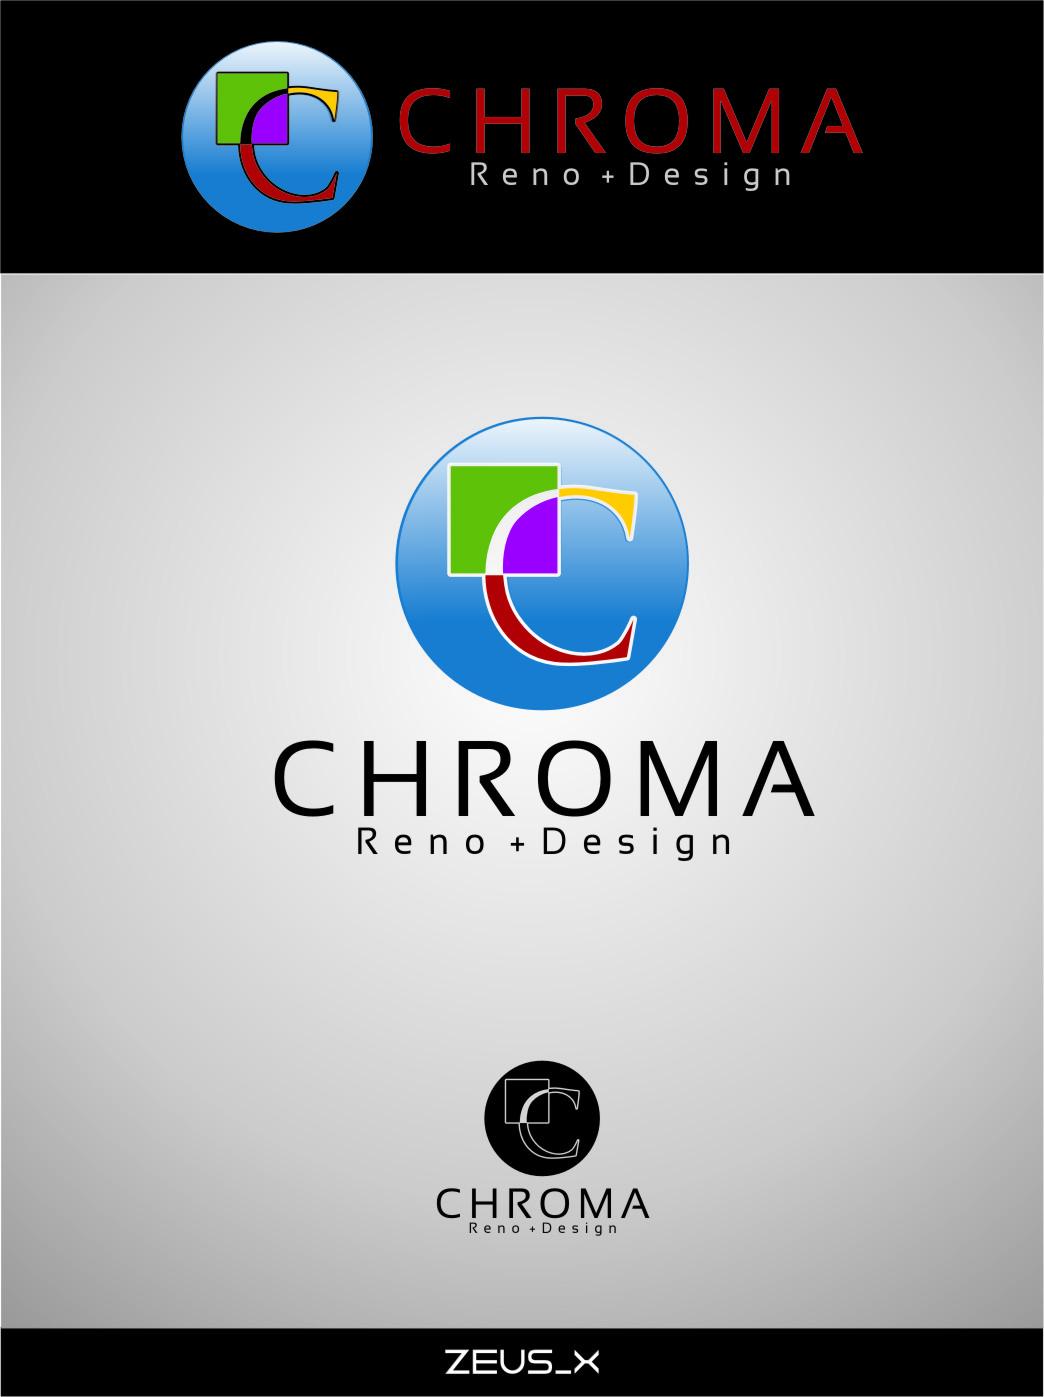 Logo Design by Ngepet_art - Entry No. 177 in the Logo Design Contest Inspiring Logo Design for Chroma Reno+Design.